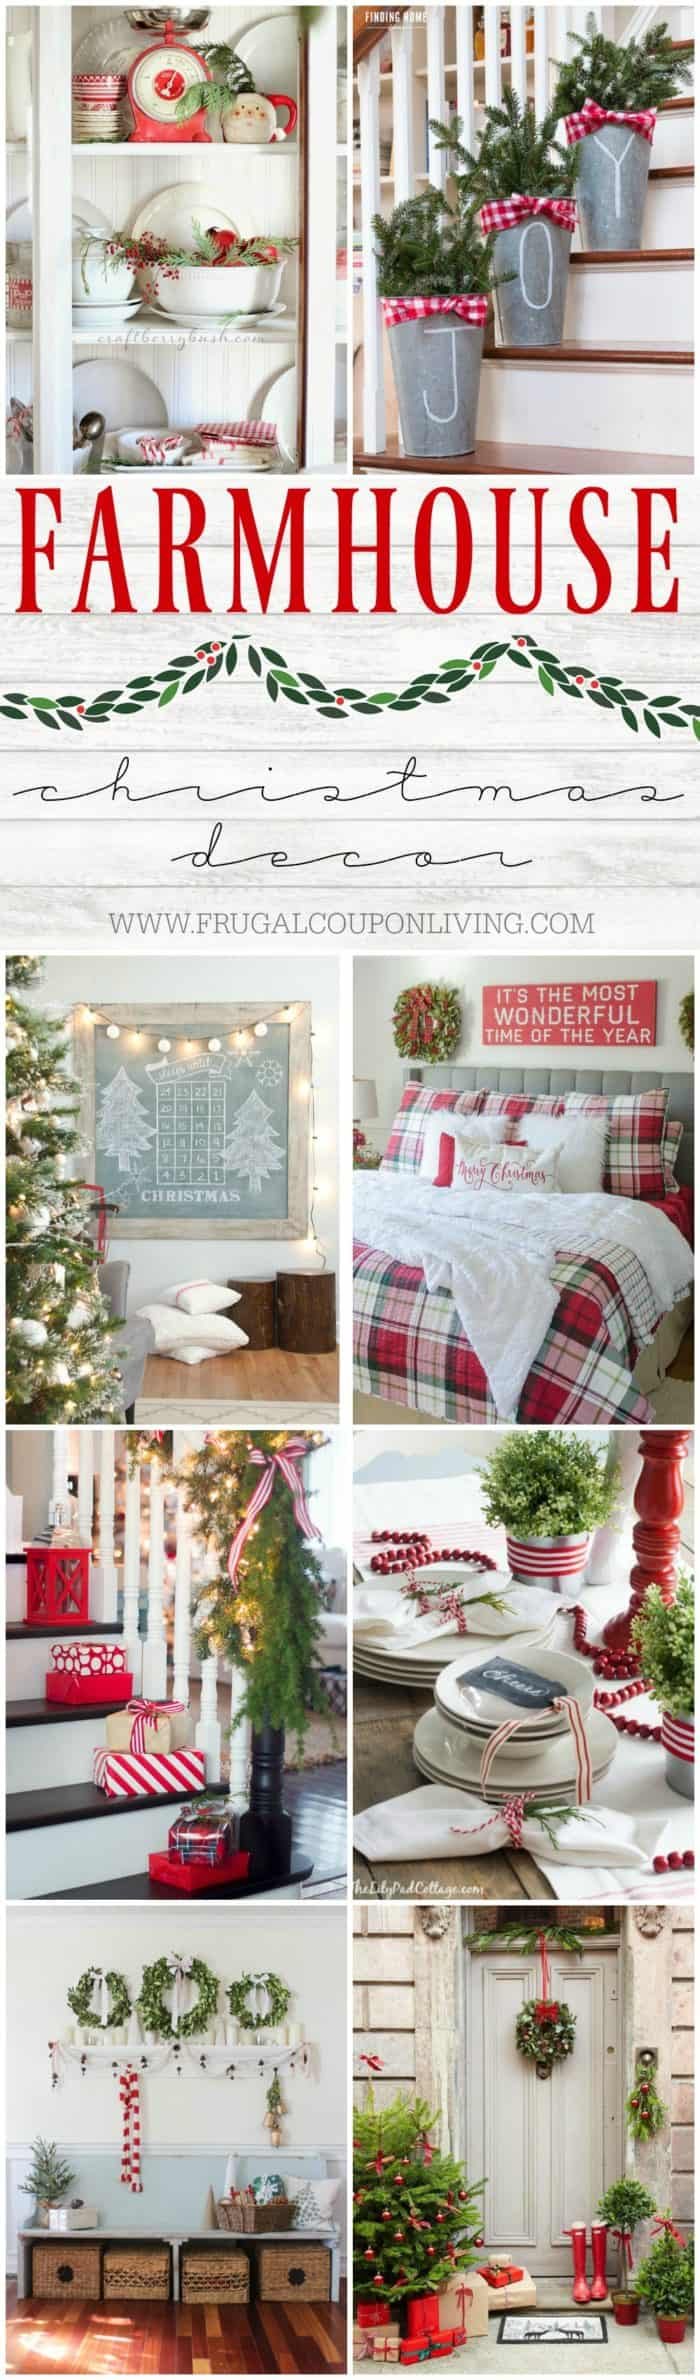 Large Of Farmhouse Christmas Decor